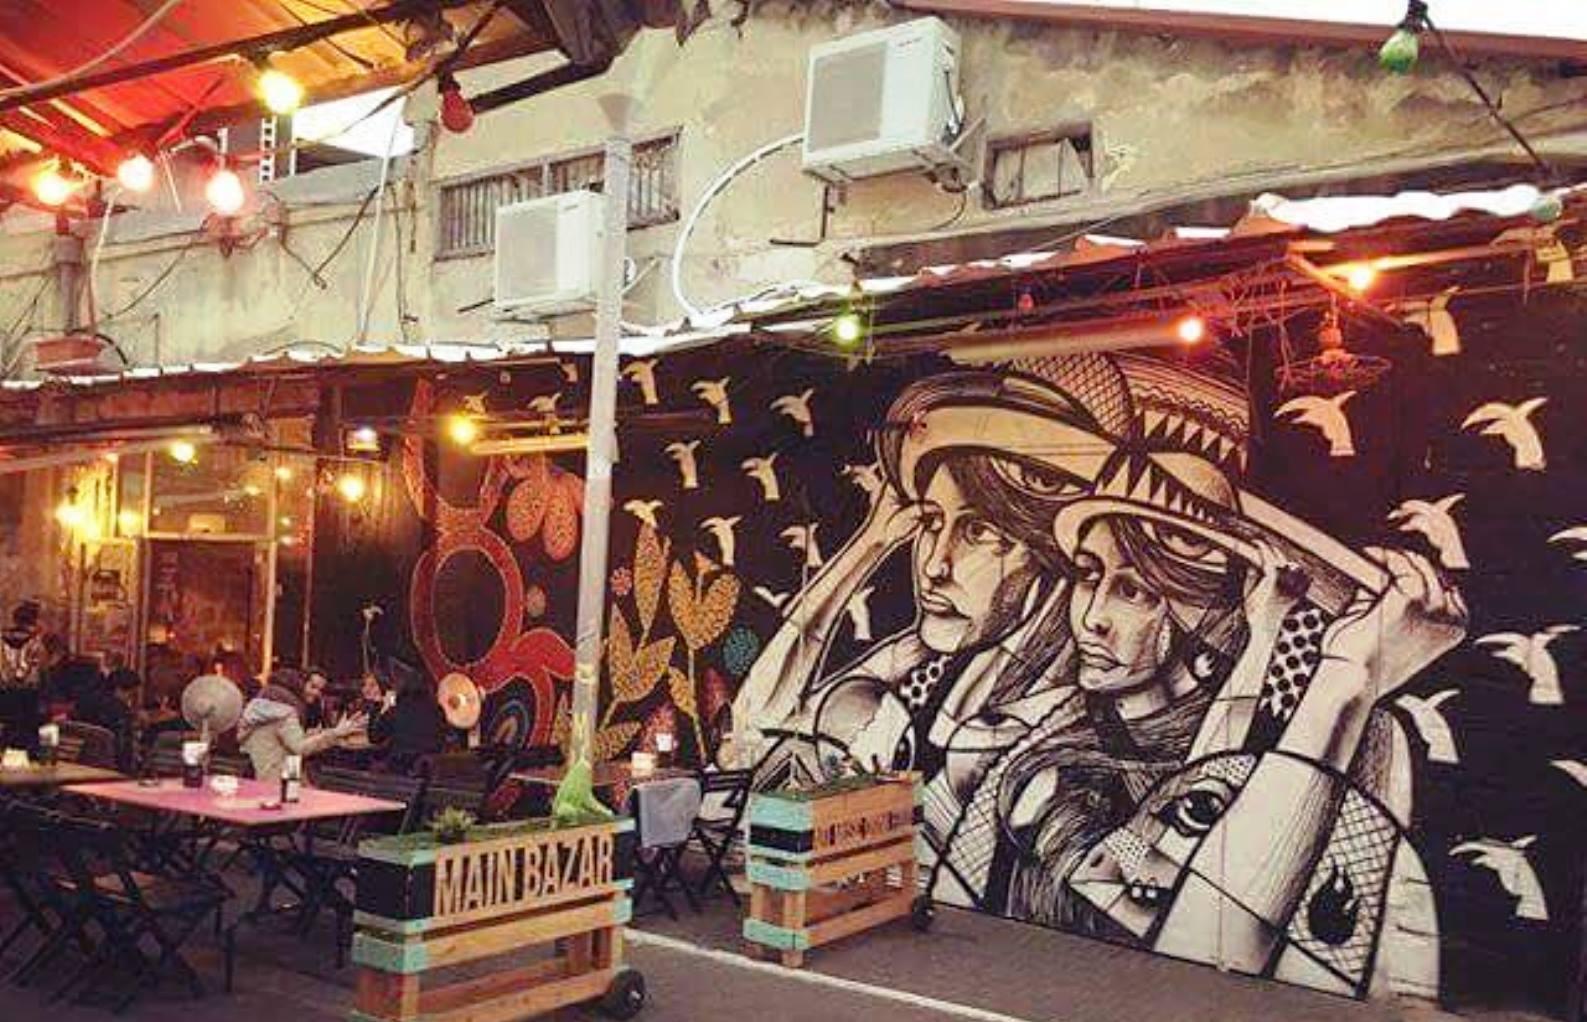 The 7 hottest nightspots in Jaffa